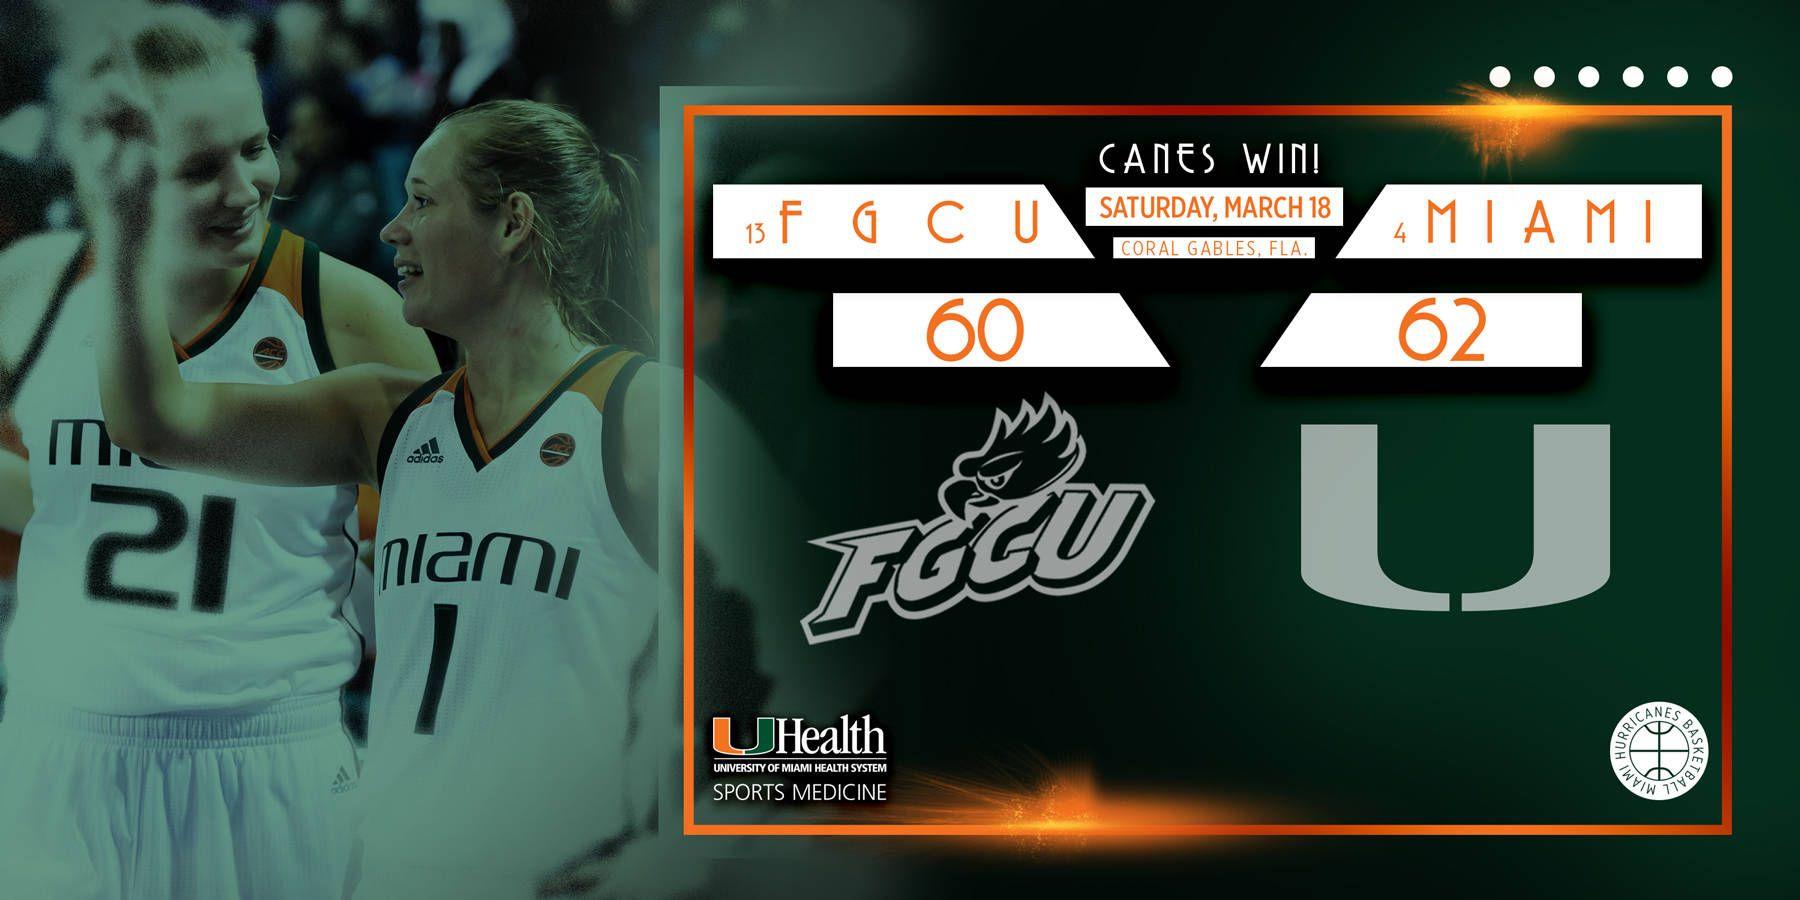 Survive and Advance: @CanesWBB Tops FGCU, 62-60